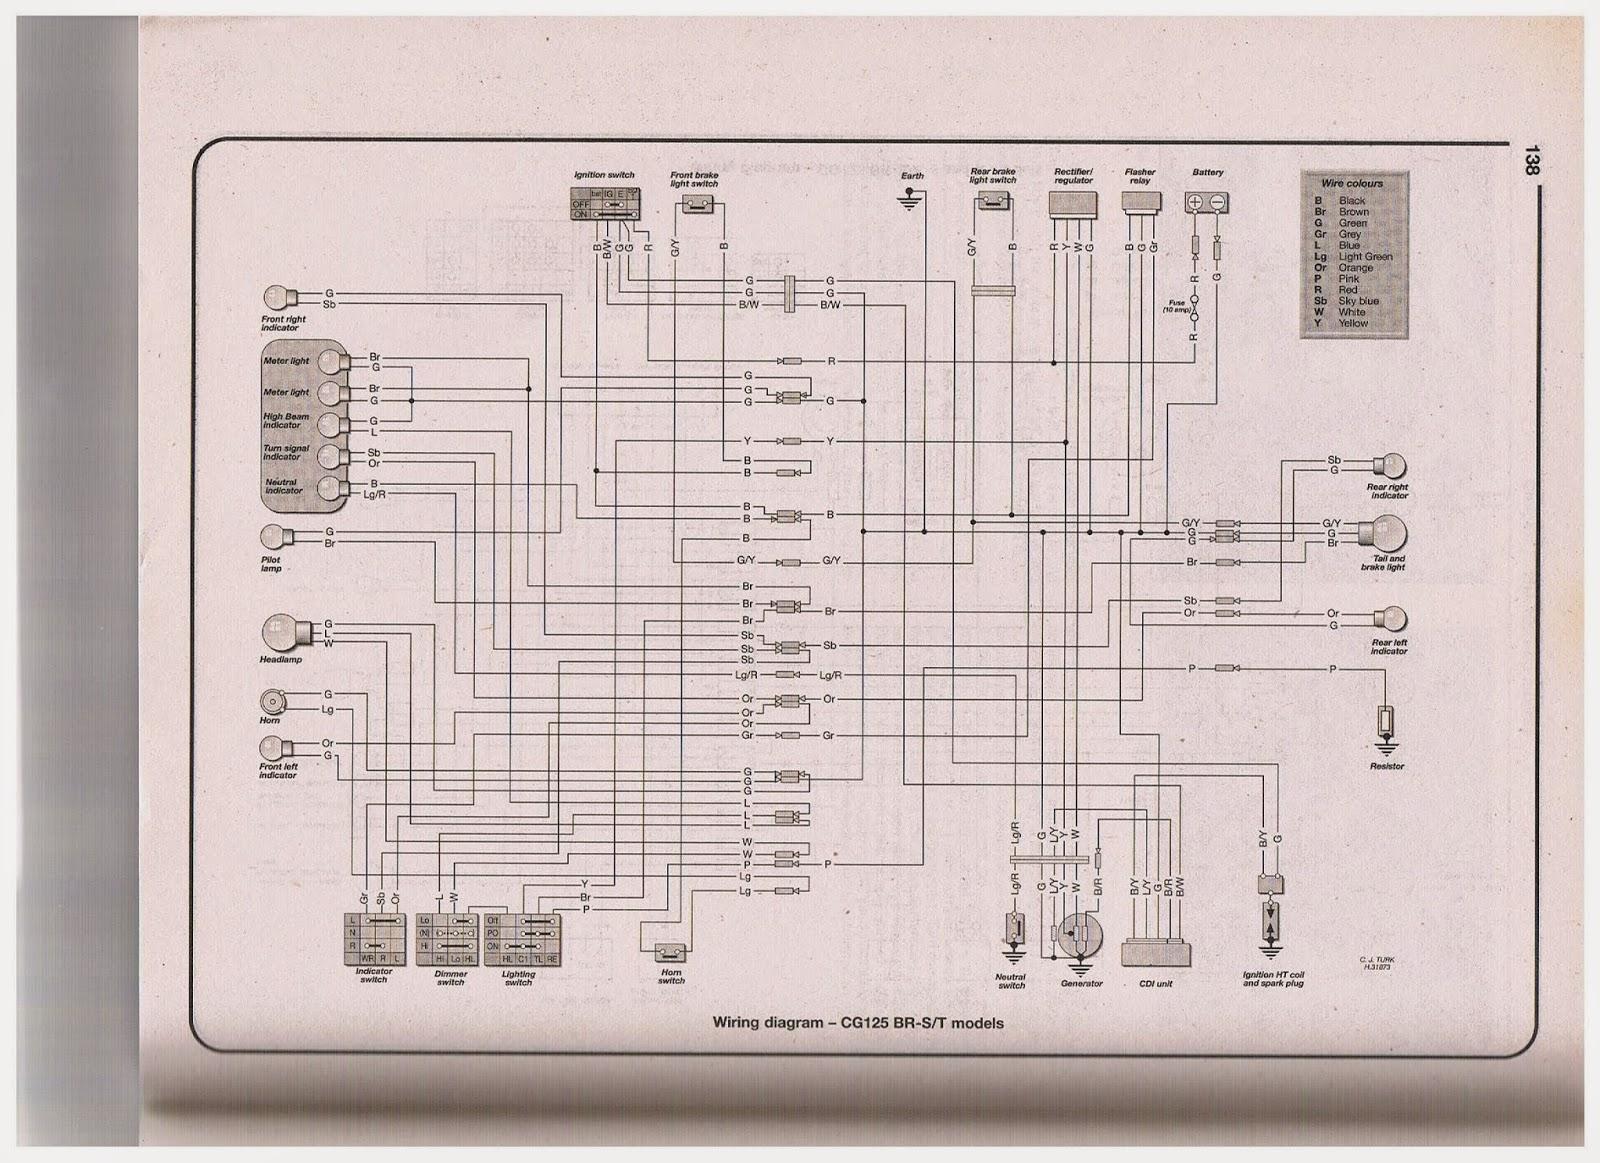 cl360 wiring diagram snatch block diagrams wiring diagram